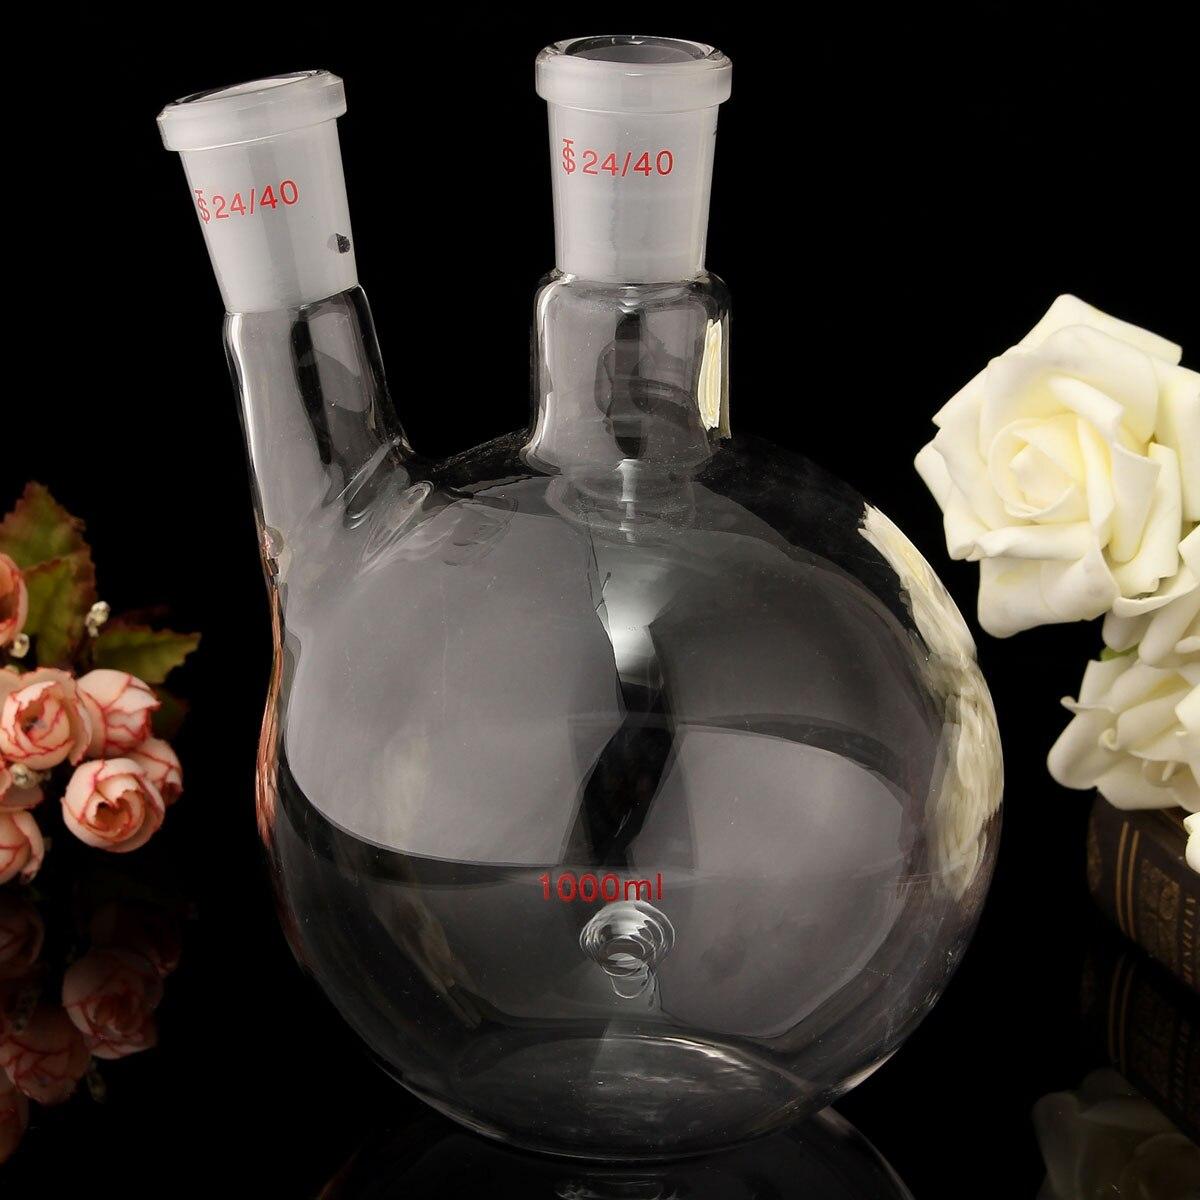 1000ml 2 Neck 24/40 Flat Bottom Glass Flask Laboratory Boiling Bottle Lab Supplies Glassware Kit Transparent Chemistry цена и фото